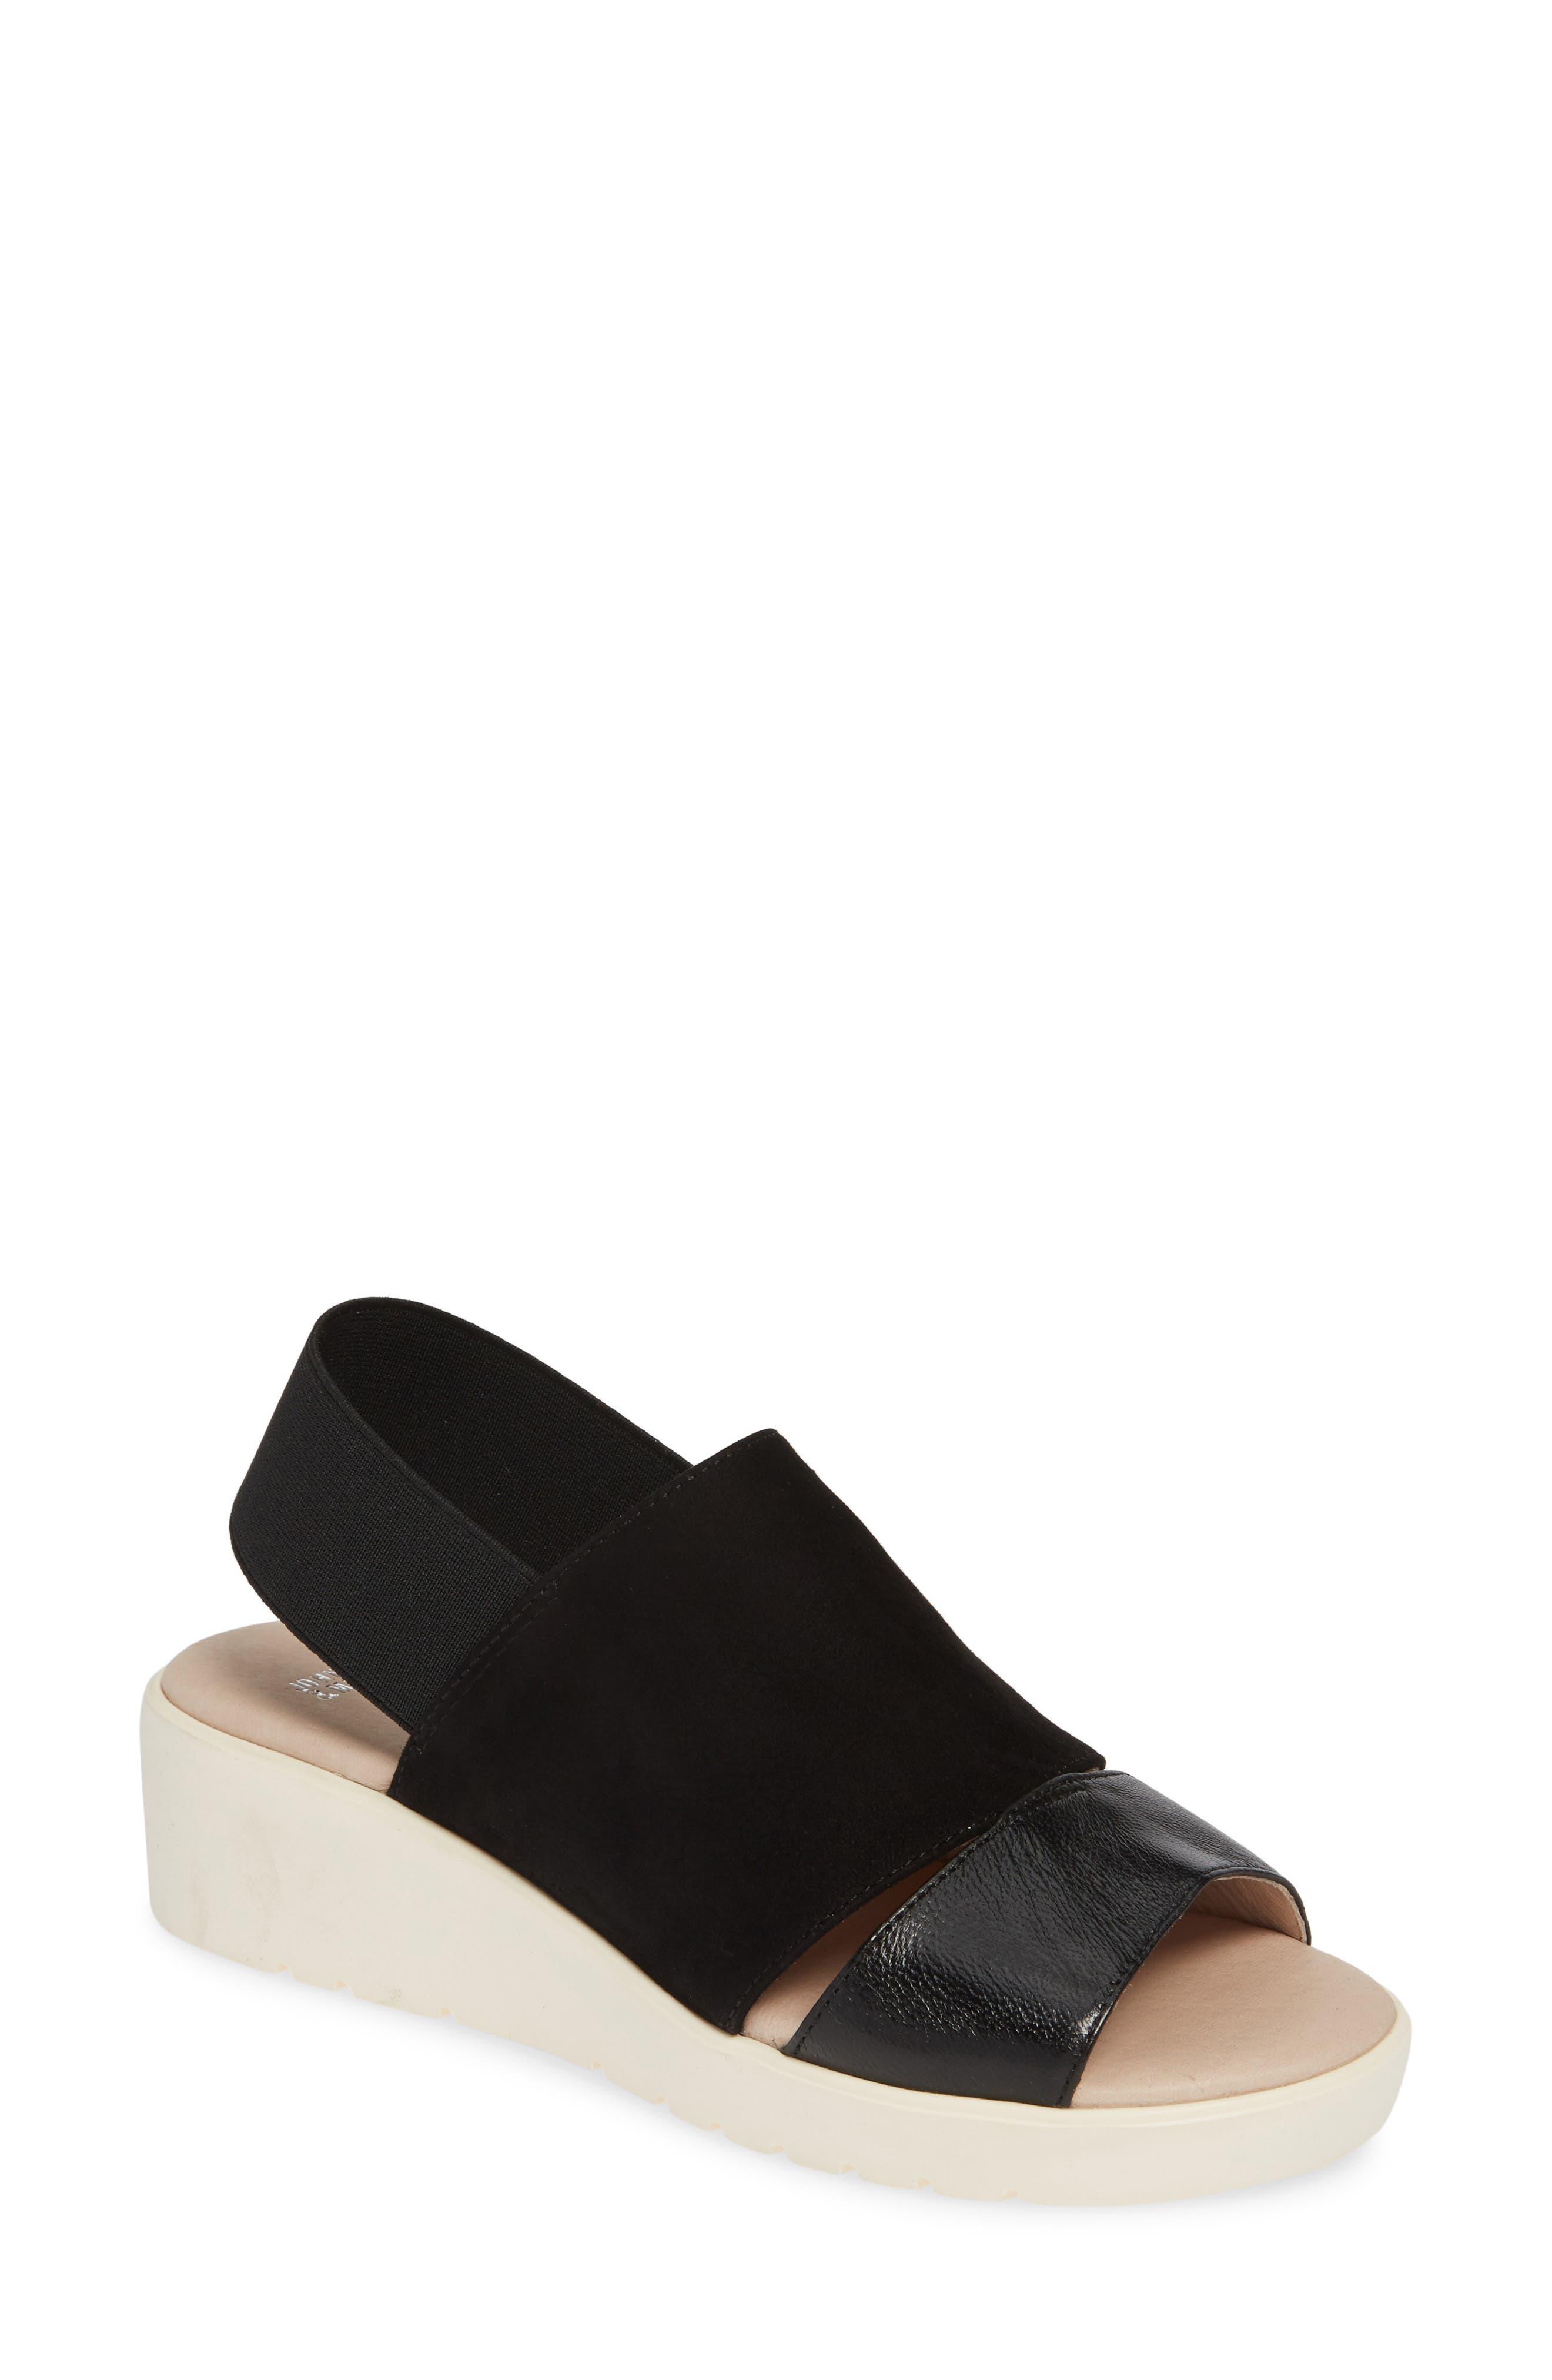 JOHNSTON & MURPHY, Cassandra Slingback Platform Sandal, Main thumbnail 1, color, BLACK LEATHER